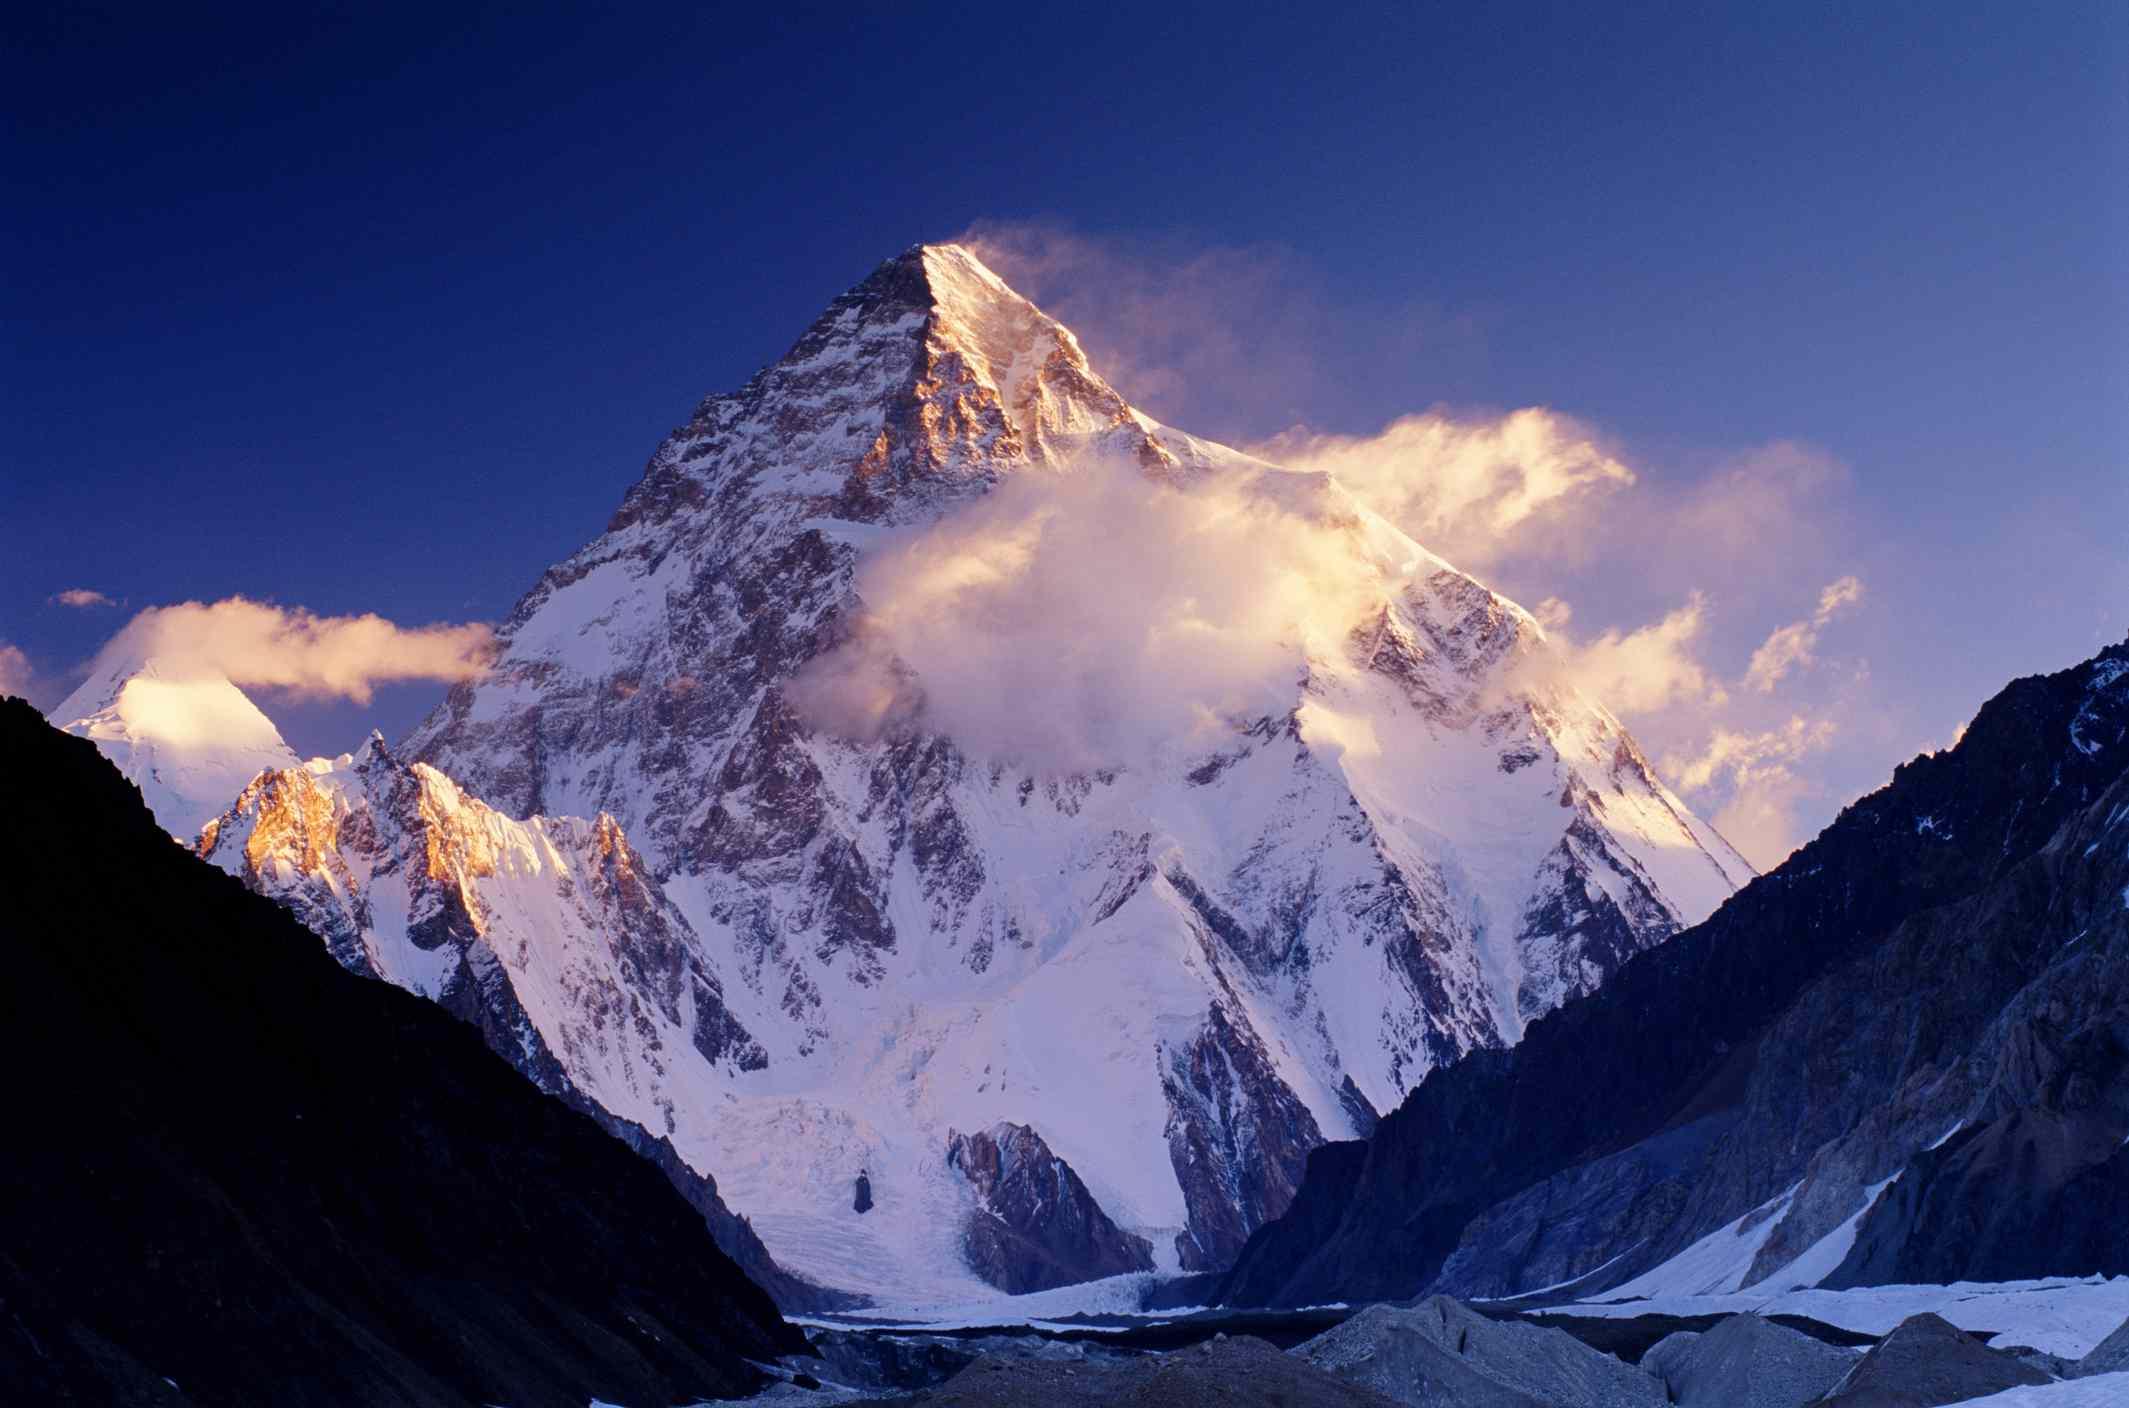 K2 mountain in Pakistan